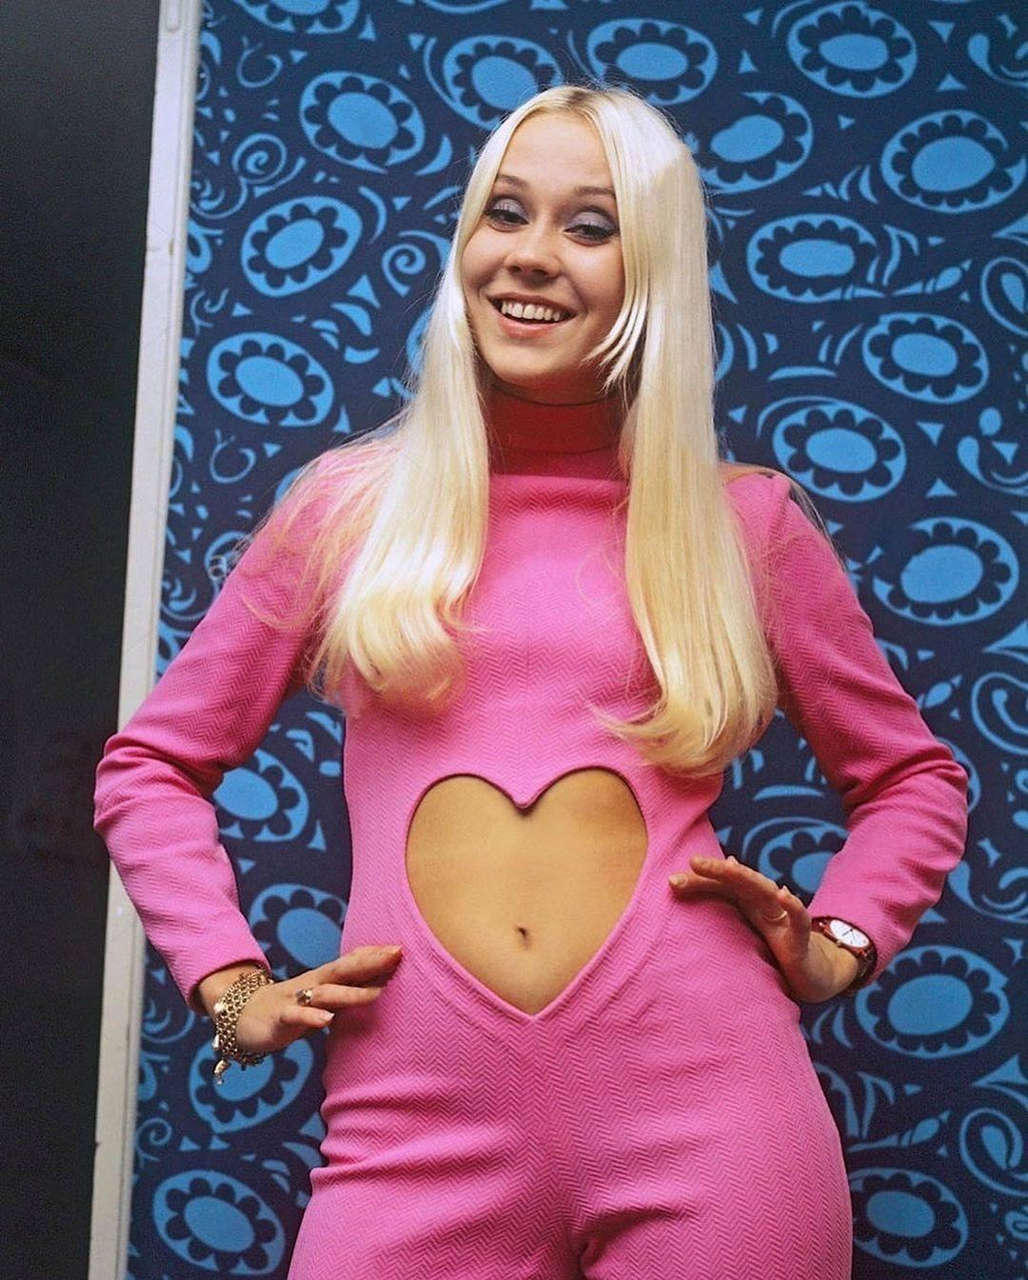 Agnetha Faltskog From Abba 1970 NSF